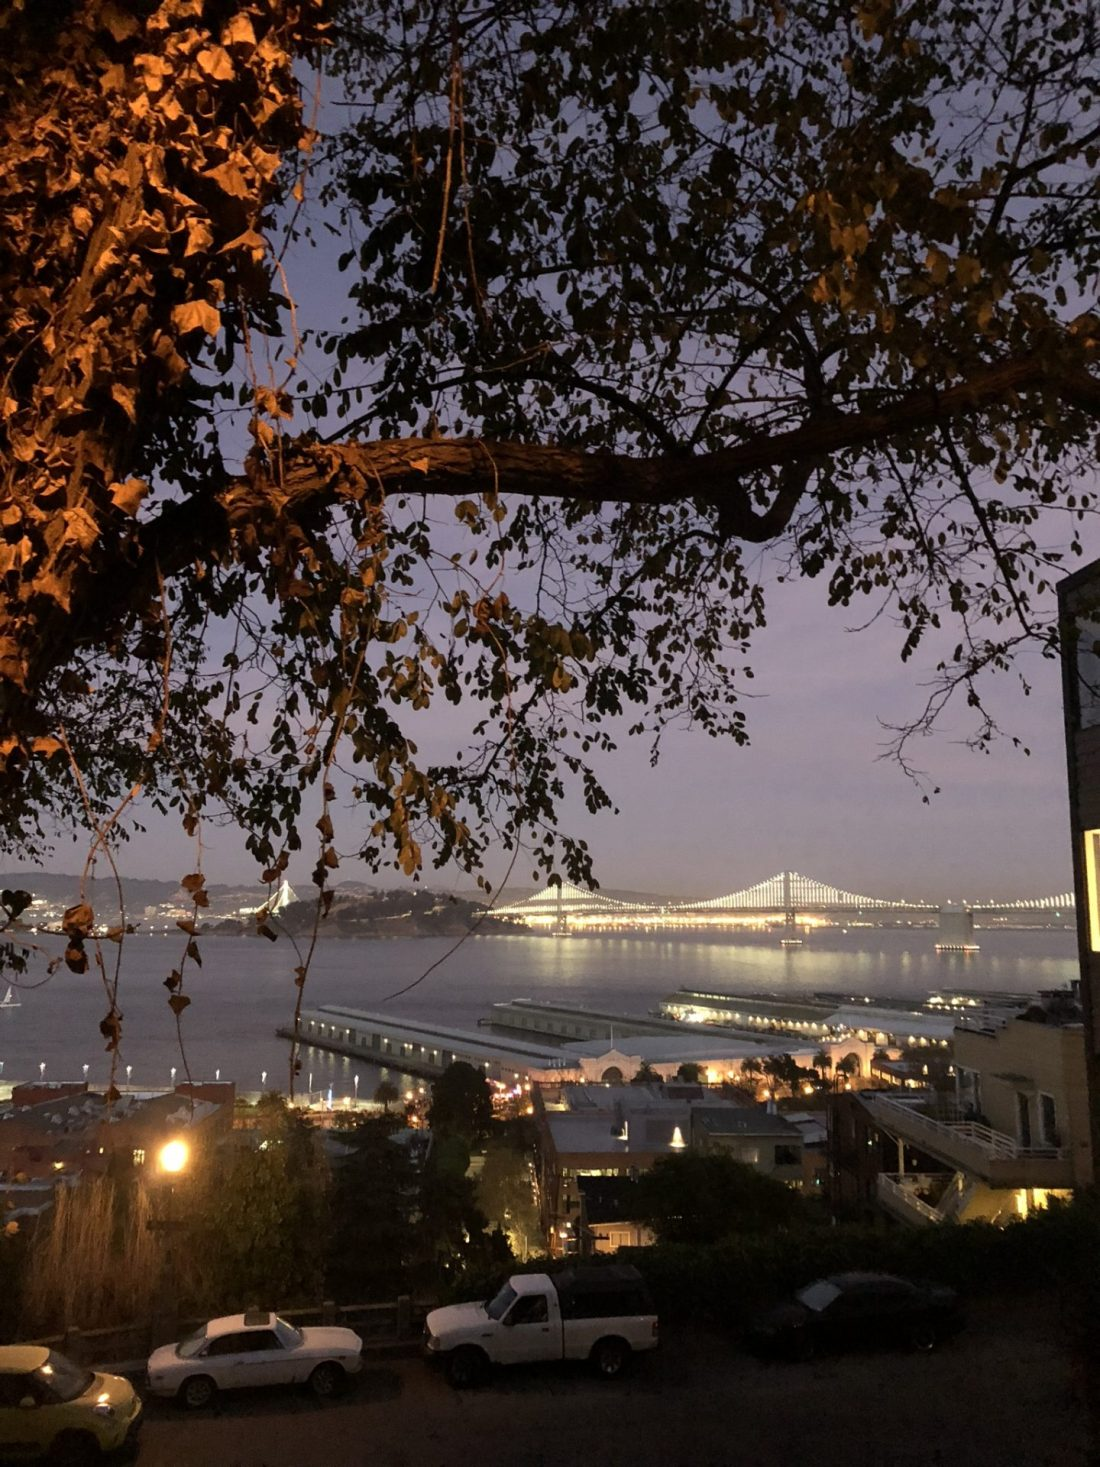 Night across the San Francisco - Oakland Bridge